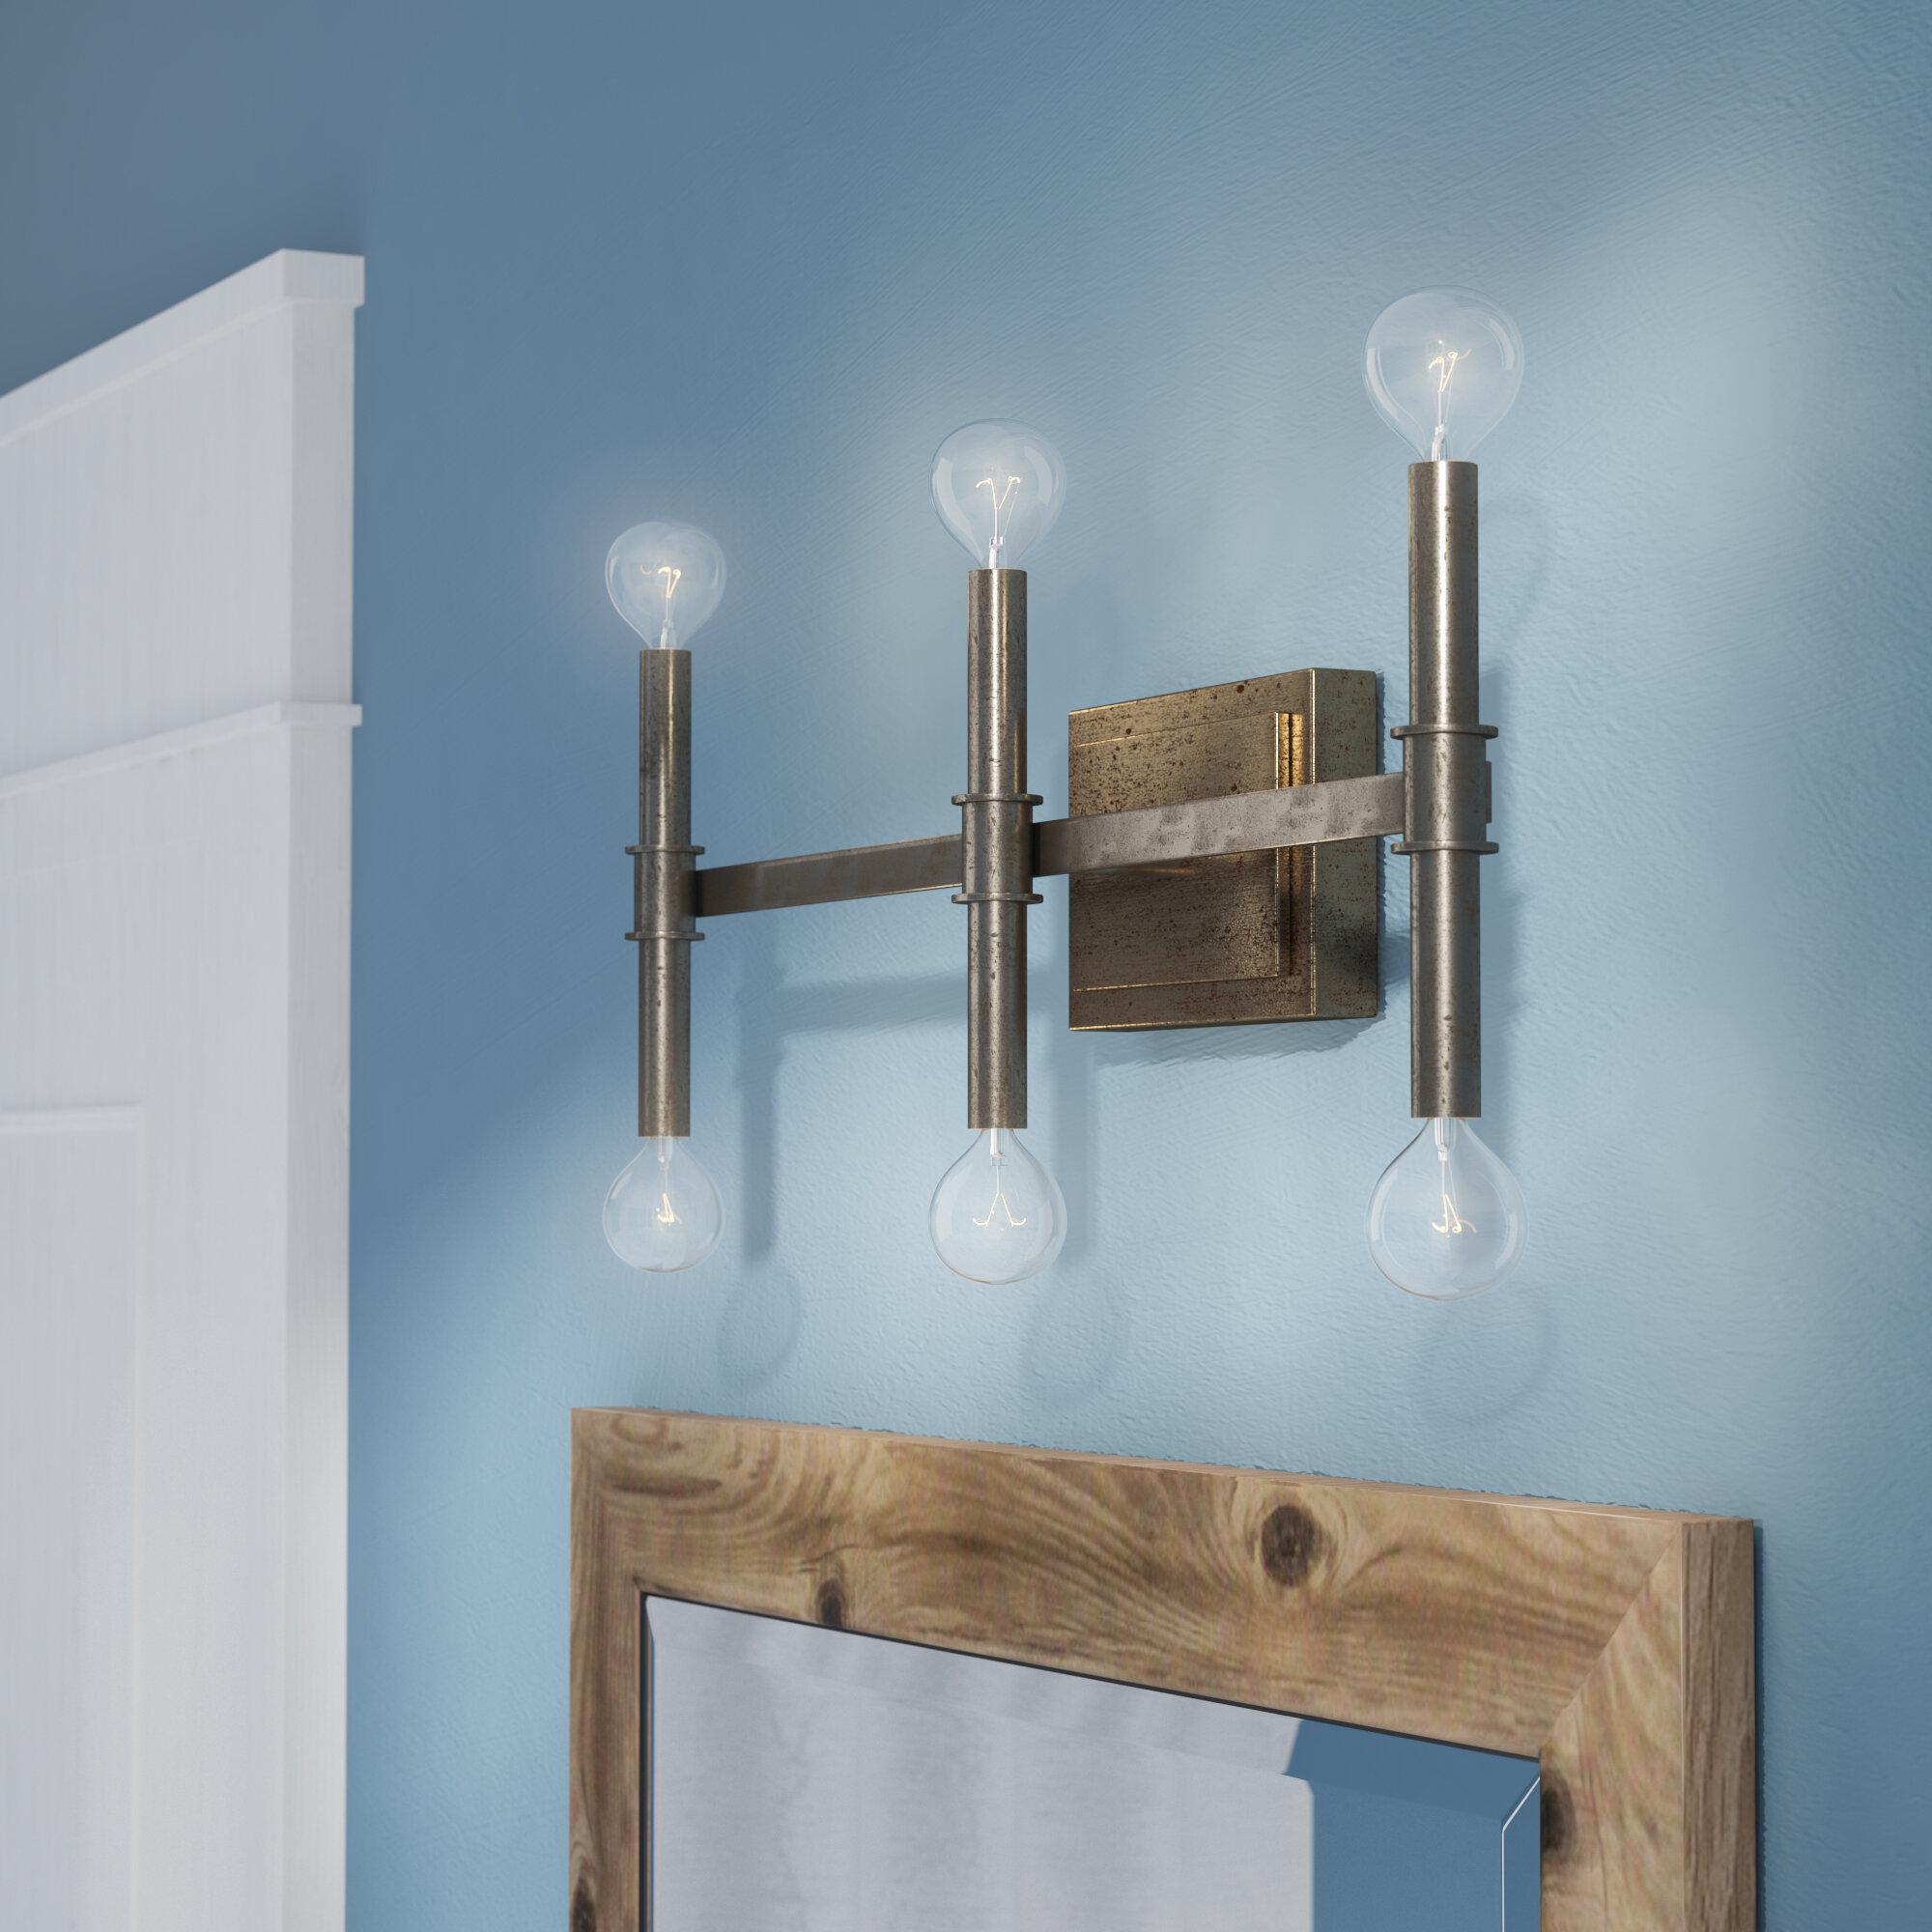 Union rustic deller 6 light vanity light reviews wayfair